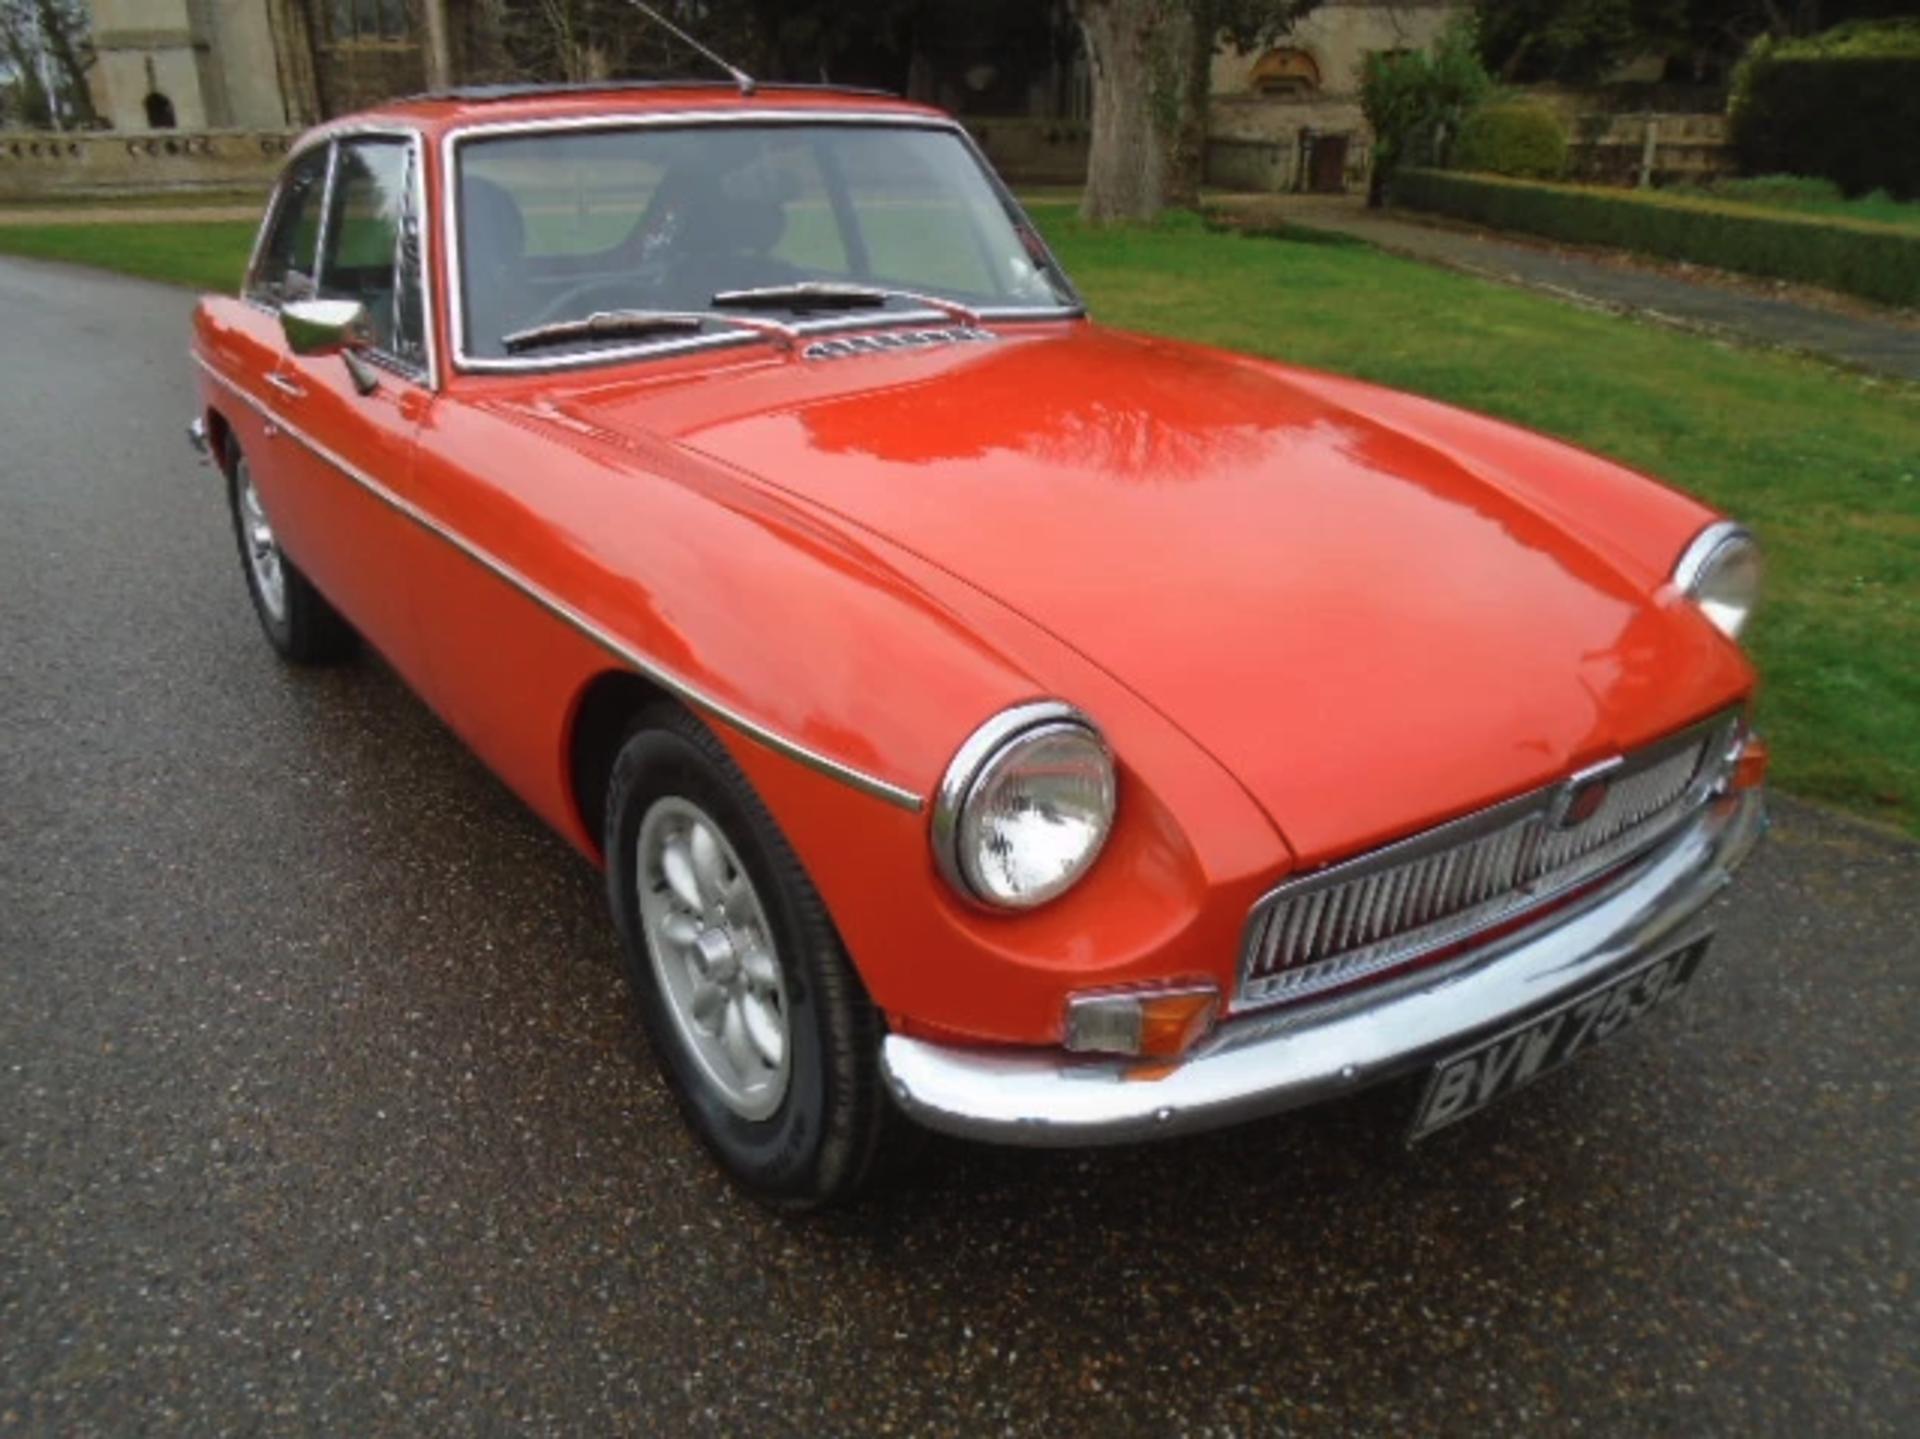 1973 MG B GT - Image 2 of 6